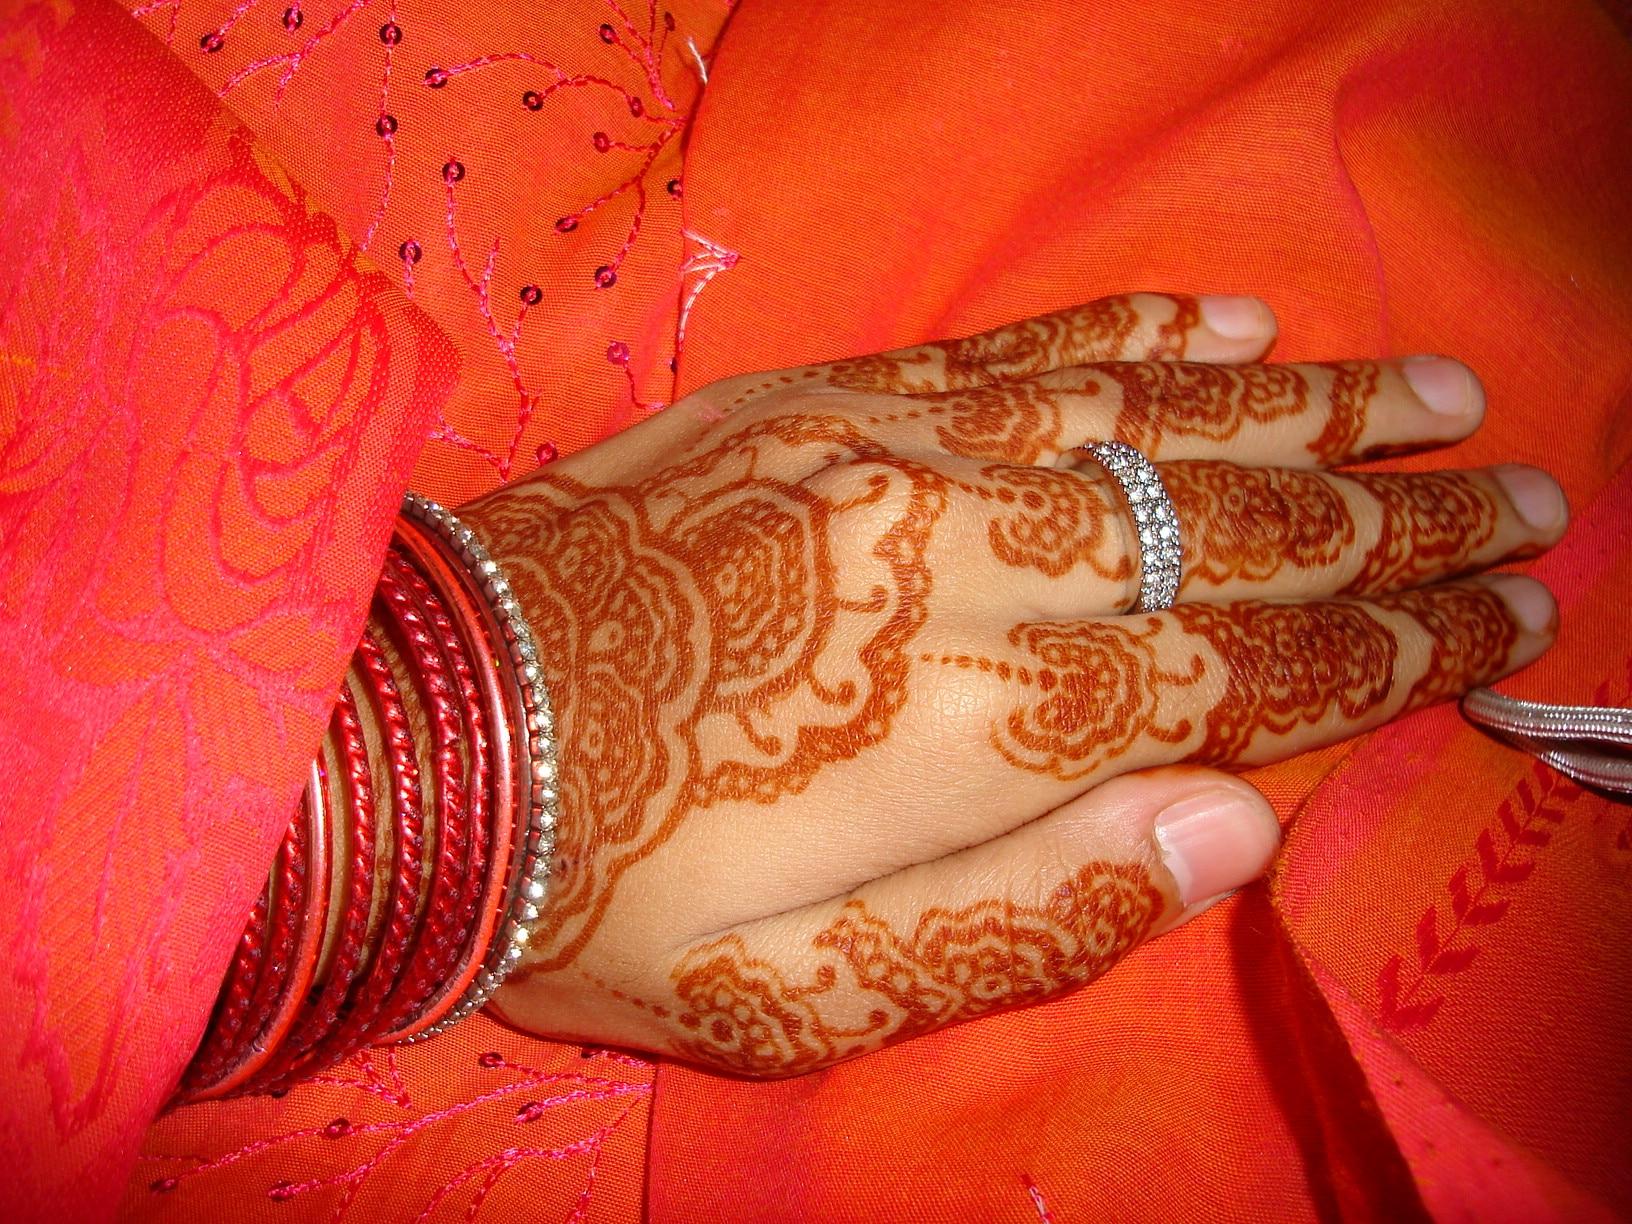 henna_decoration_on_palm_prior_to_islamic_wedding_061919020248.jpg